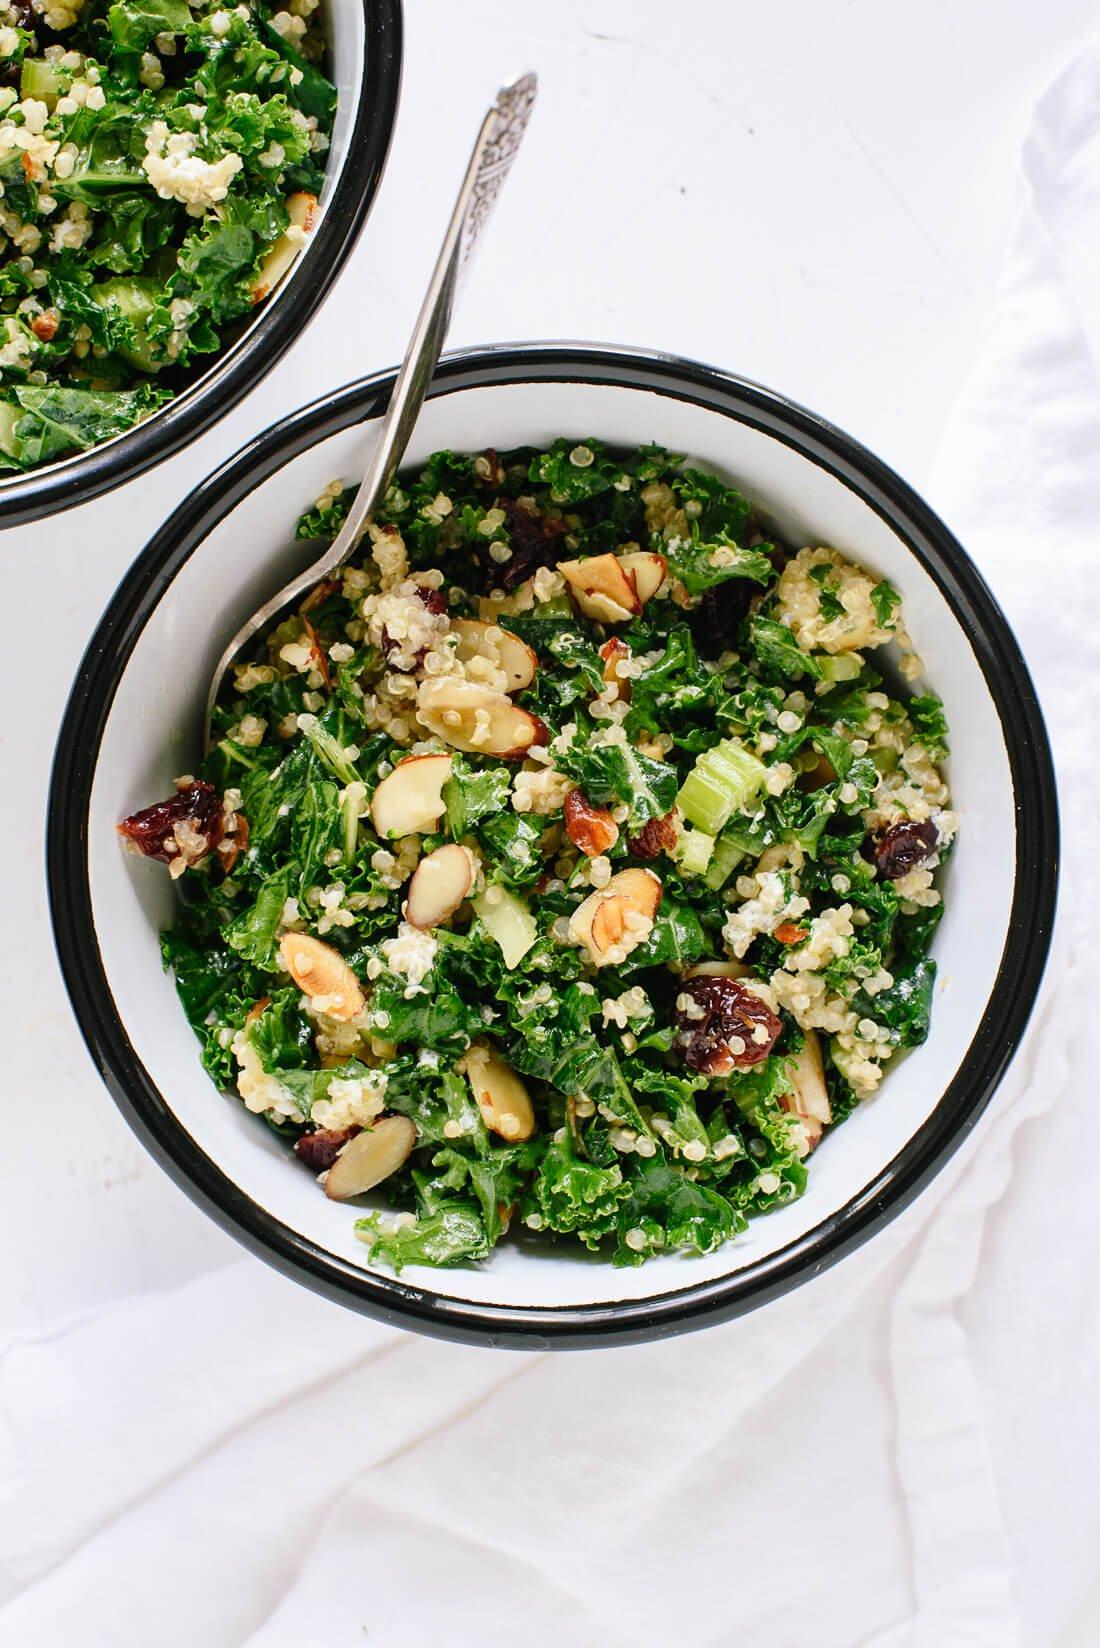 Kale and Quinoa Salad with Crisp Celery, Plumped Cranberries, and Lemon Dressing